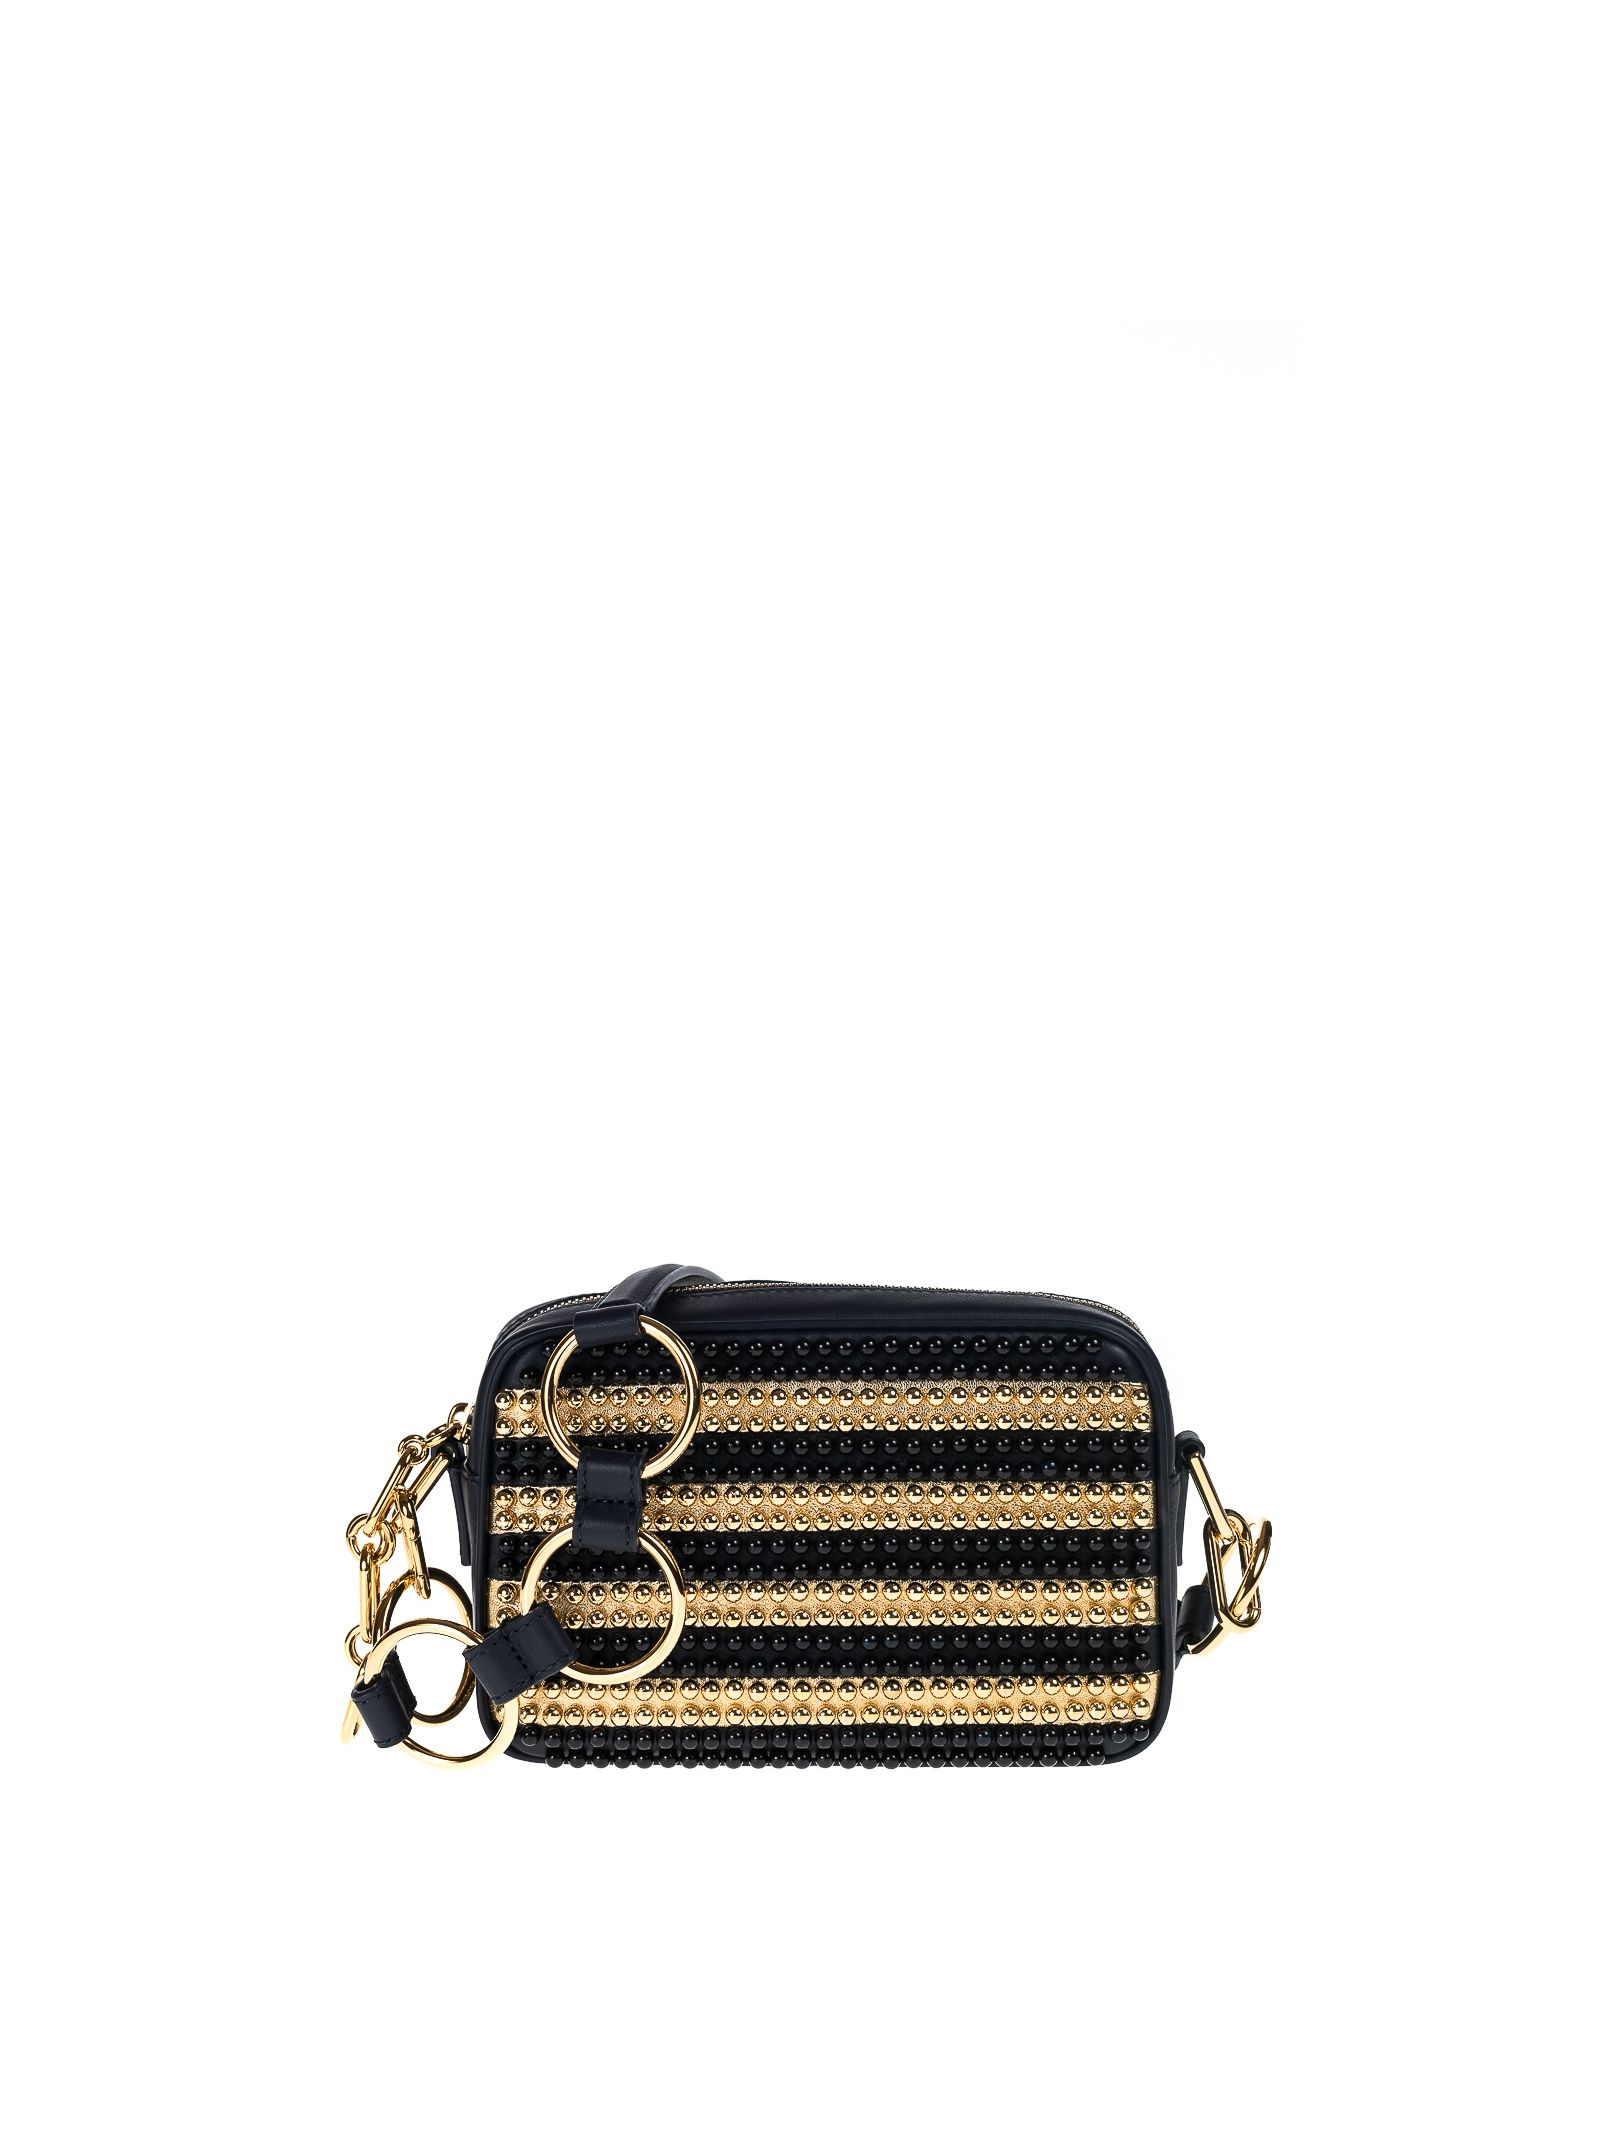 michael kors female michael kors julie small studded leather camera bag